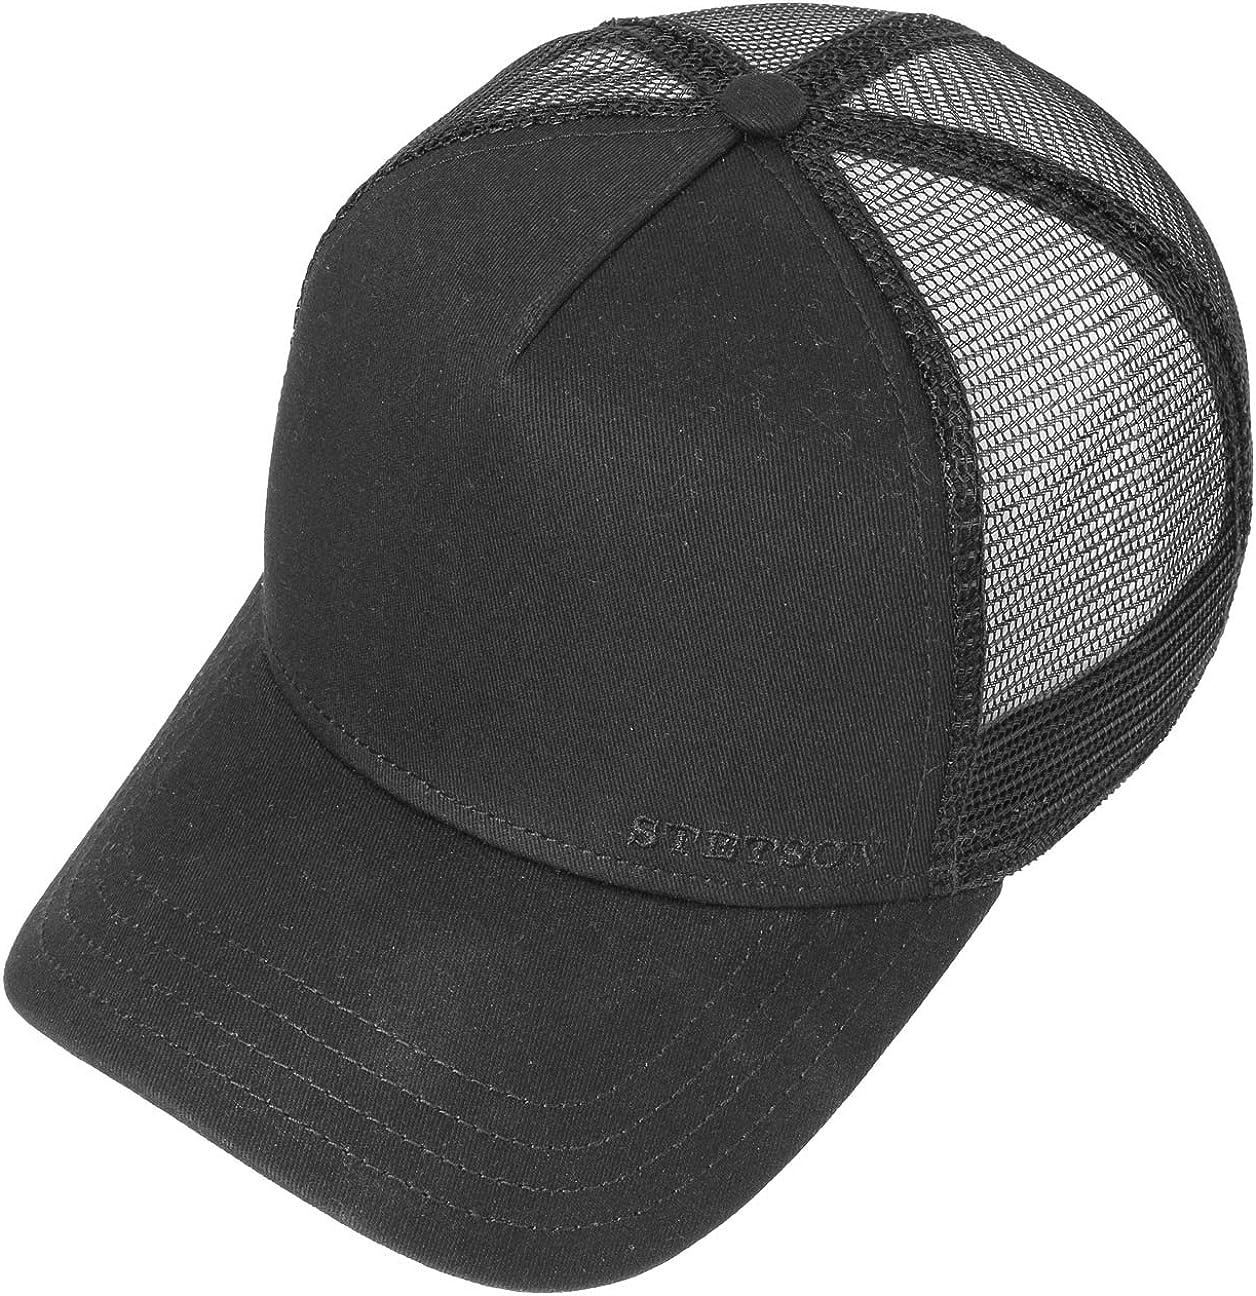 STETSON Classic Cotton Trucker Cap Truckercap Mesh Meshcap Basecap Baseballcap